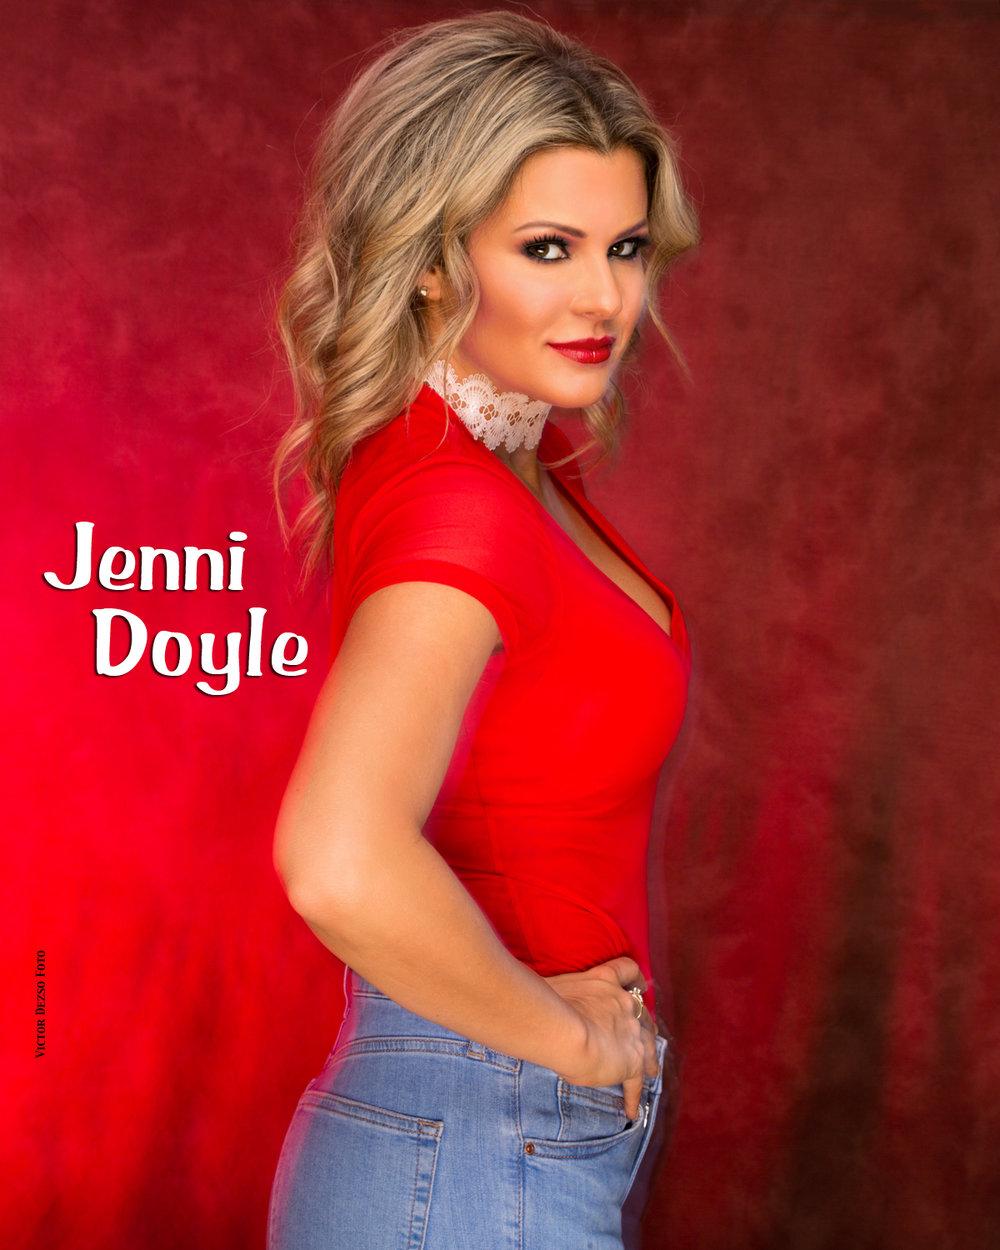 Jenni Doyle_Jun 11_2017_L6177_1_4x5_pp.jpg